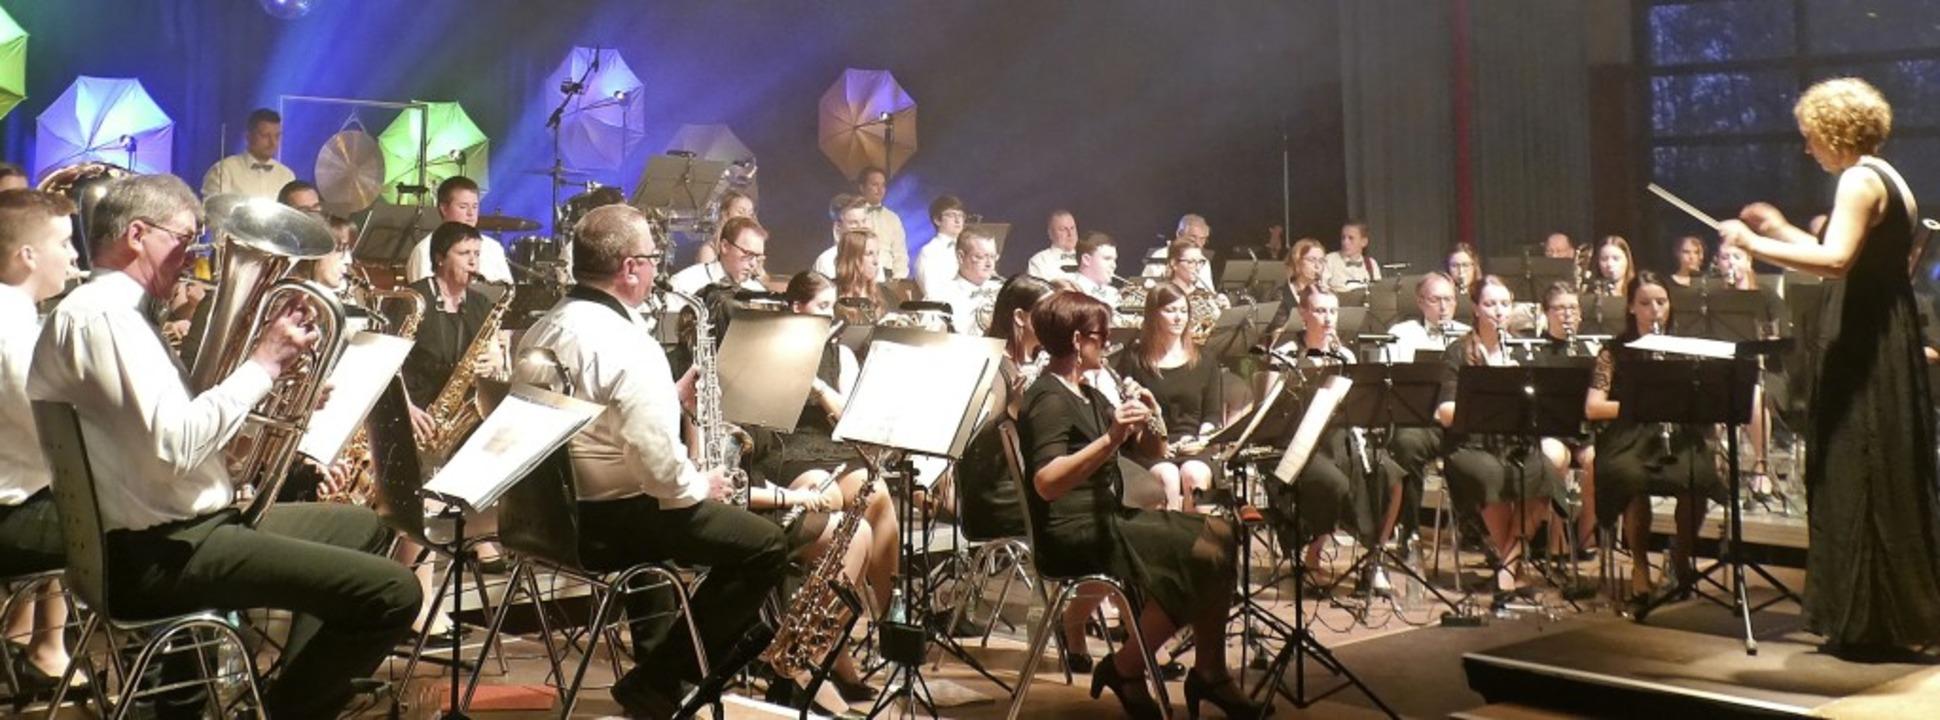 Lisa Kietz (rechts) vertrat die erkran...atja Wößner als musikalische Leiterin.    Foto: Christa Hülter-Hassler